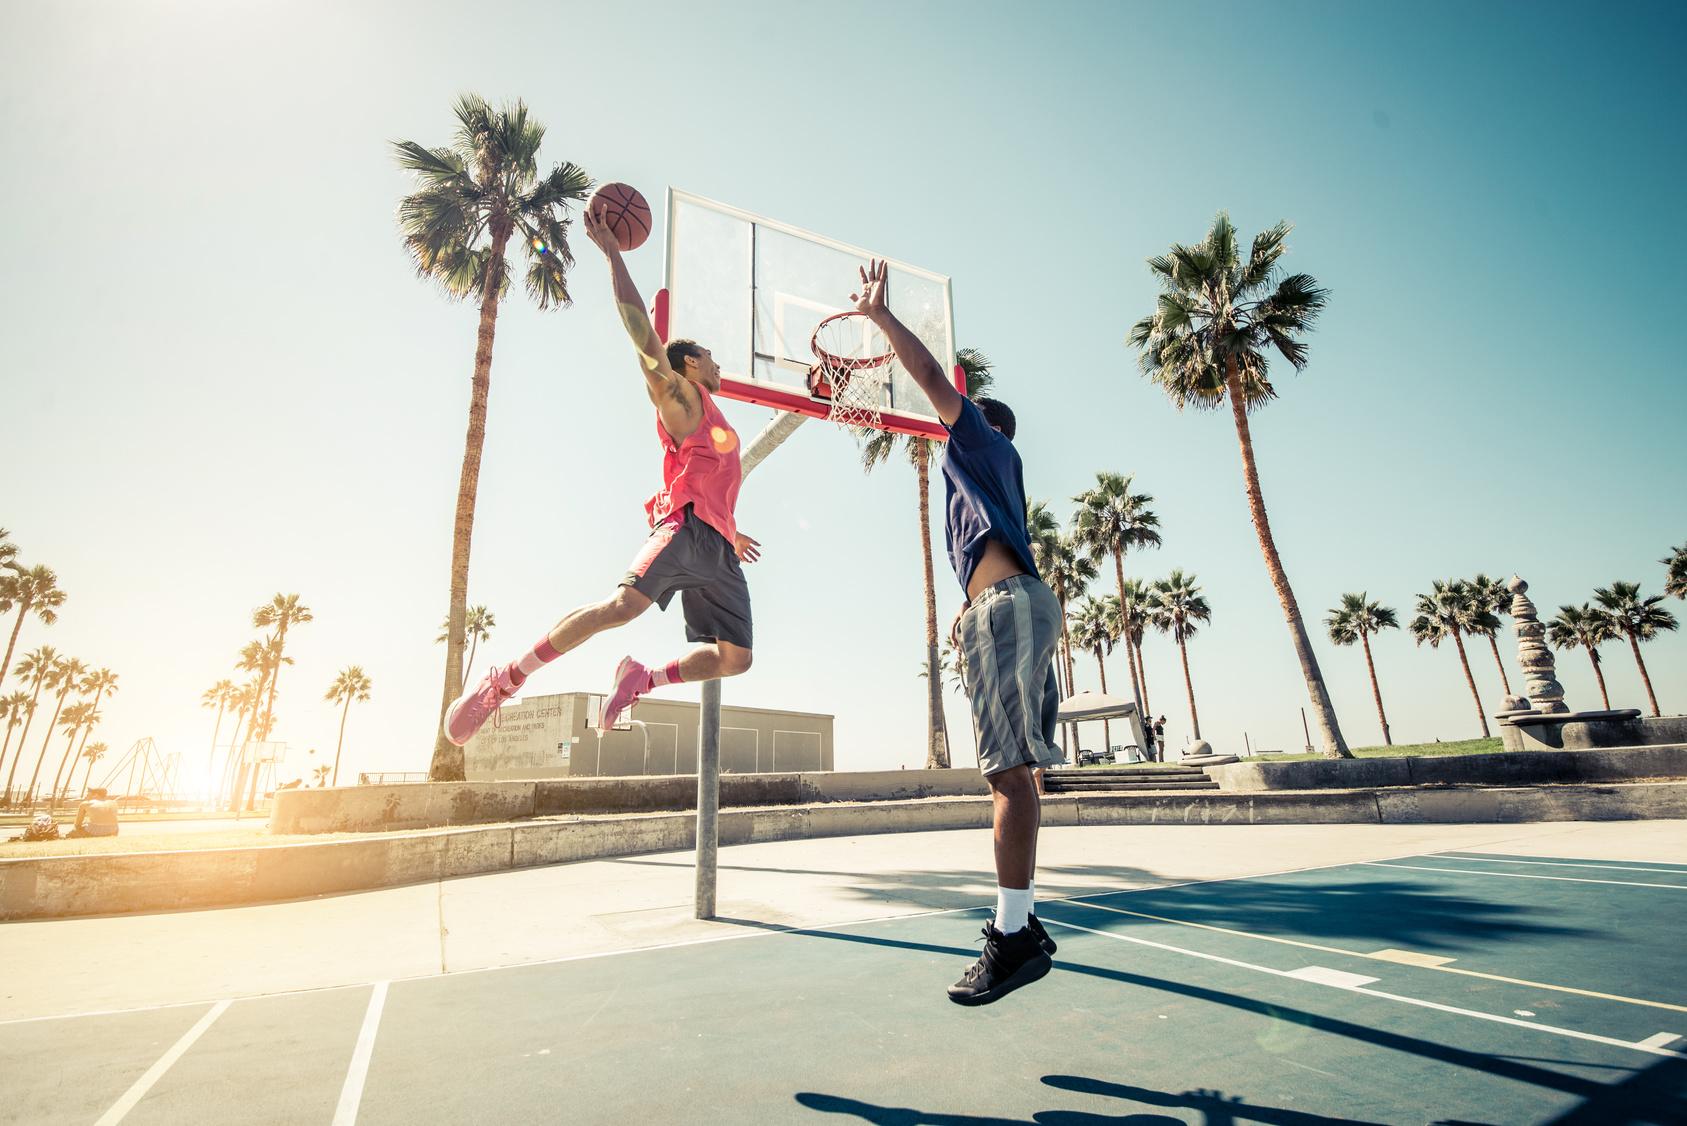 Playing Basketball in Venice Beach Venice Beach 1687x1126